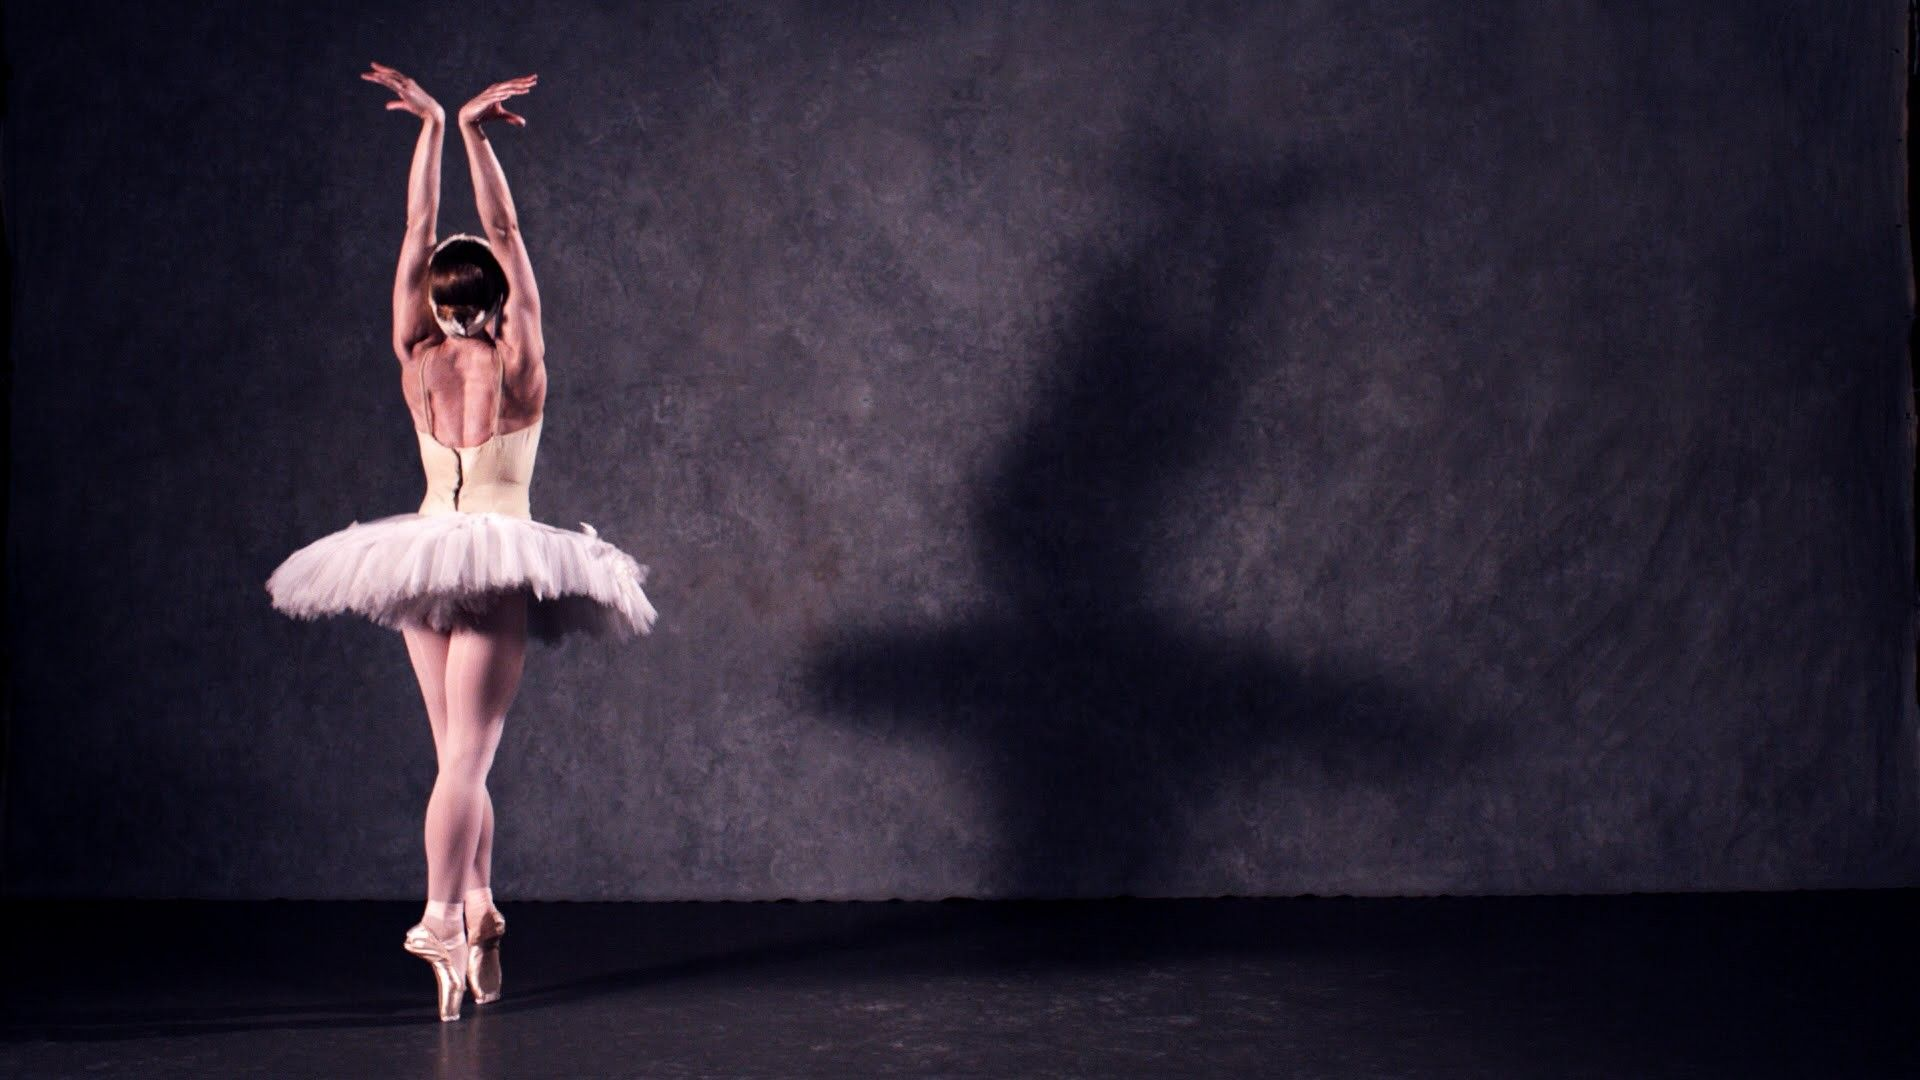 jazz dancer wallpaper - photo #1